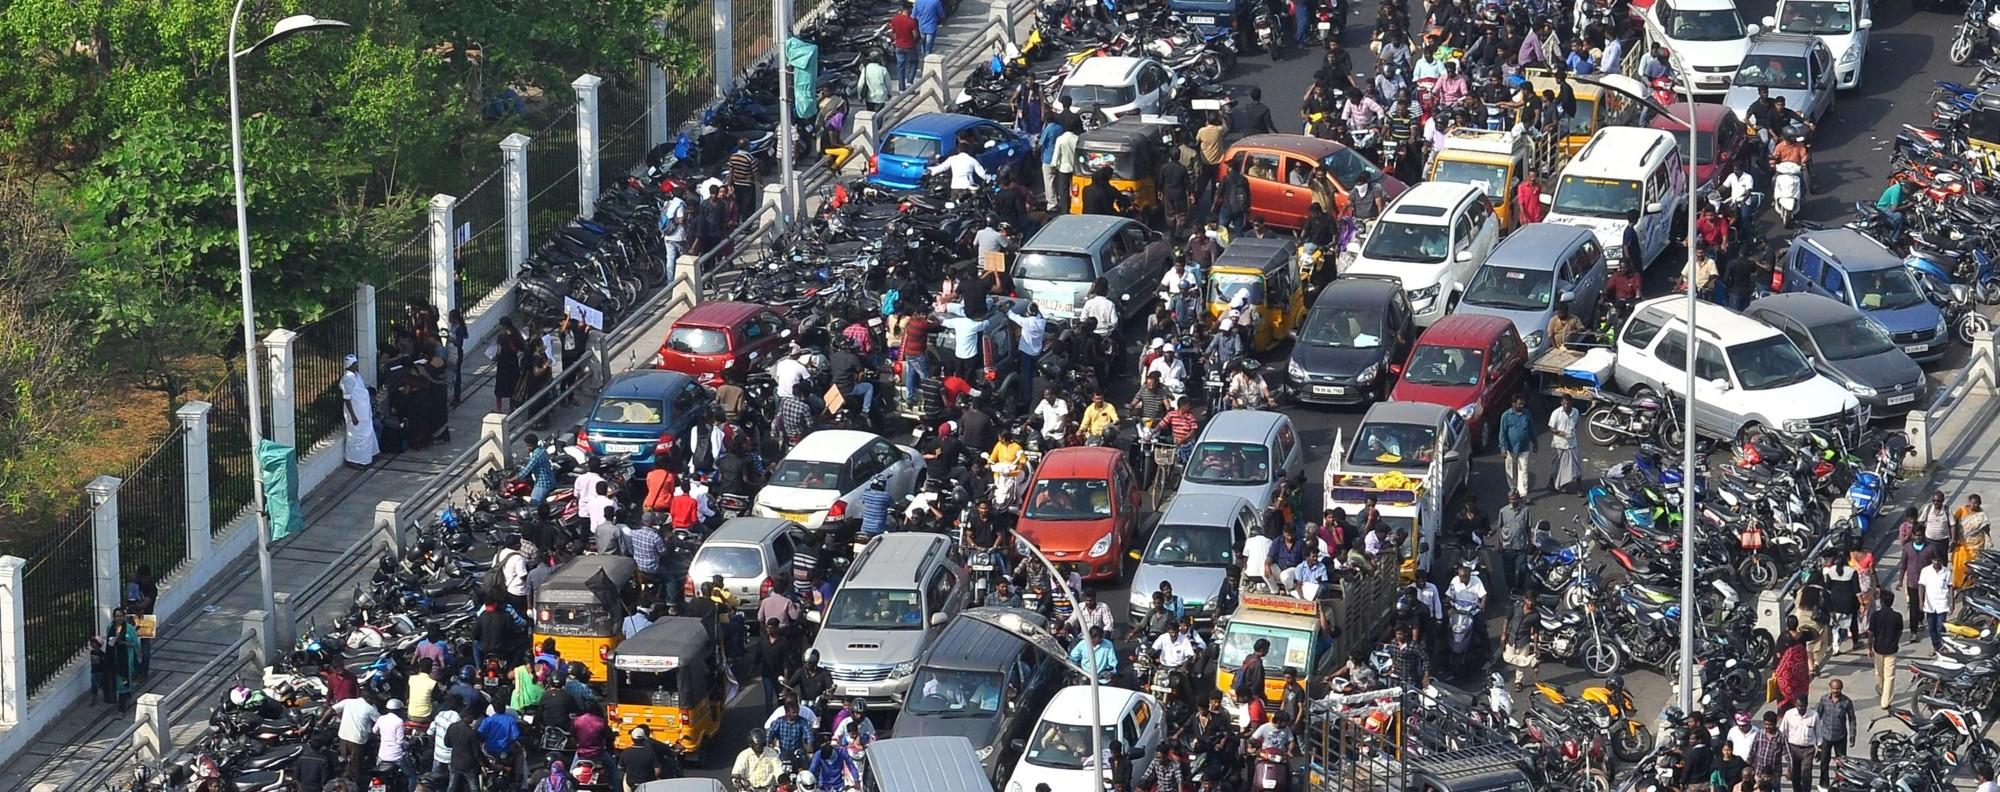 Protestors fill the streets in Tamil Nadu. Photo: EPA